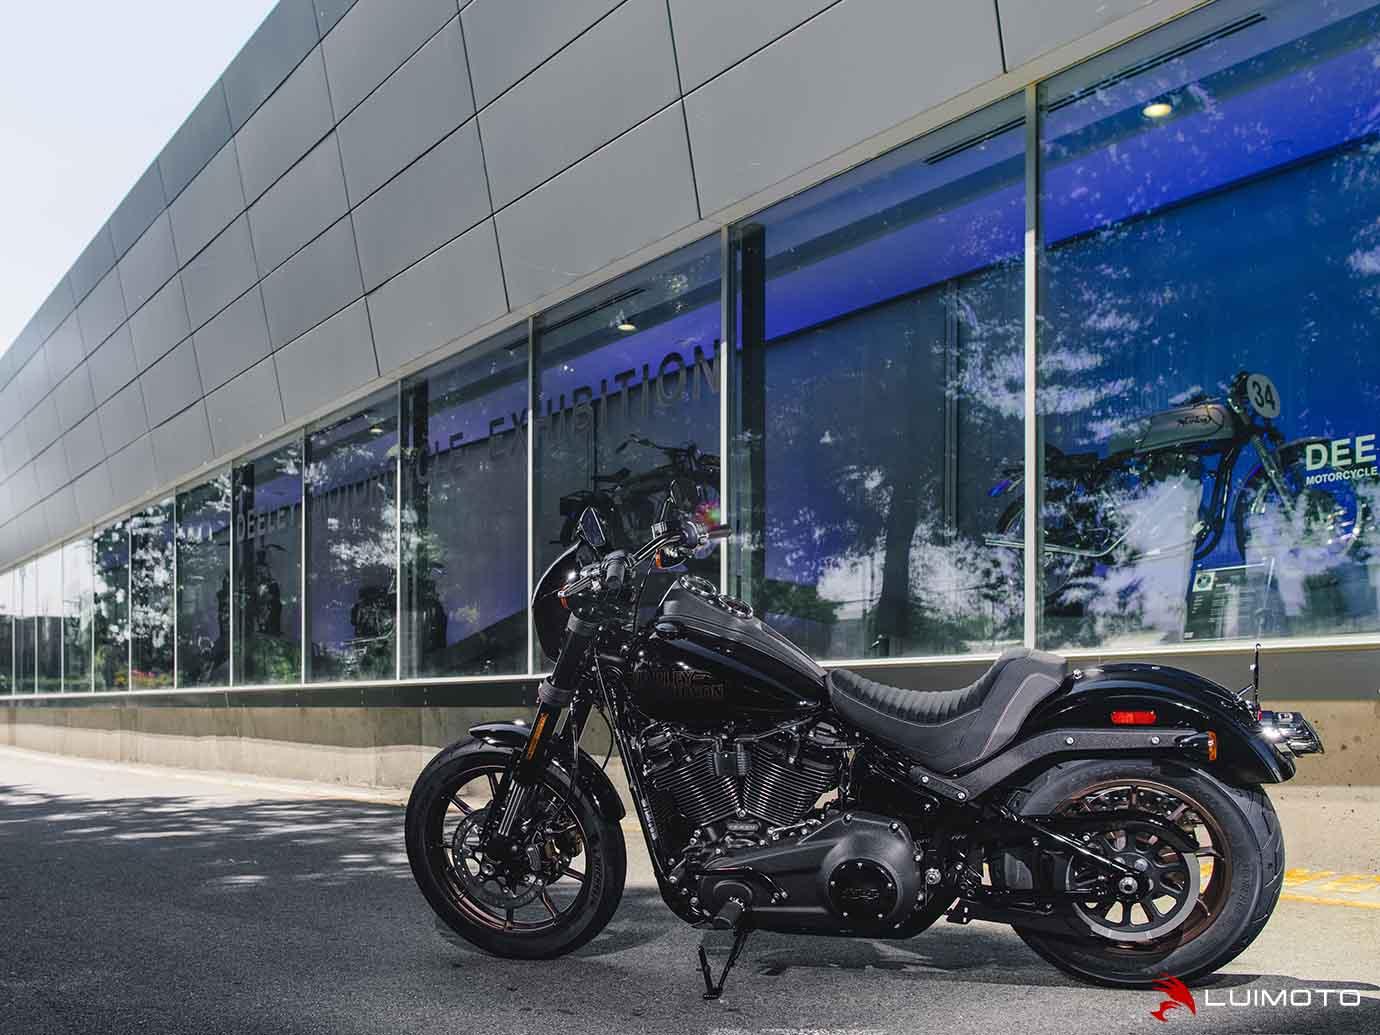 LUIMOTO (ルイモト) Classic / フロント シート カバー Harley Davidson LOW RIDER S 16-20